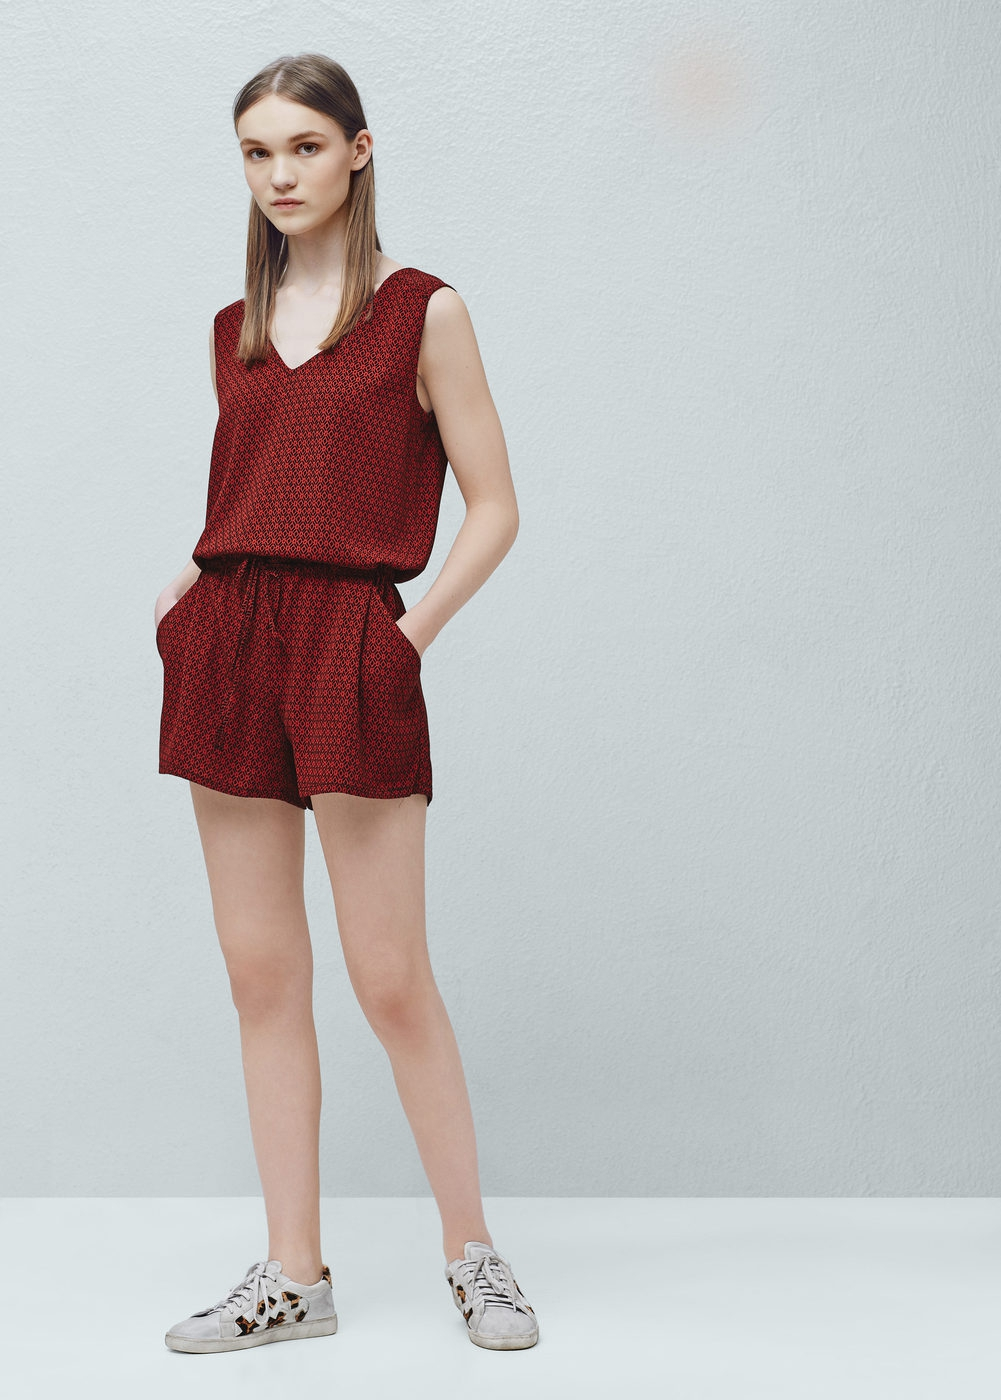 Shoppen: 15x zomerse korte jumpsuits